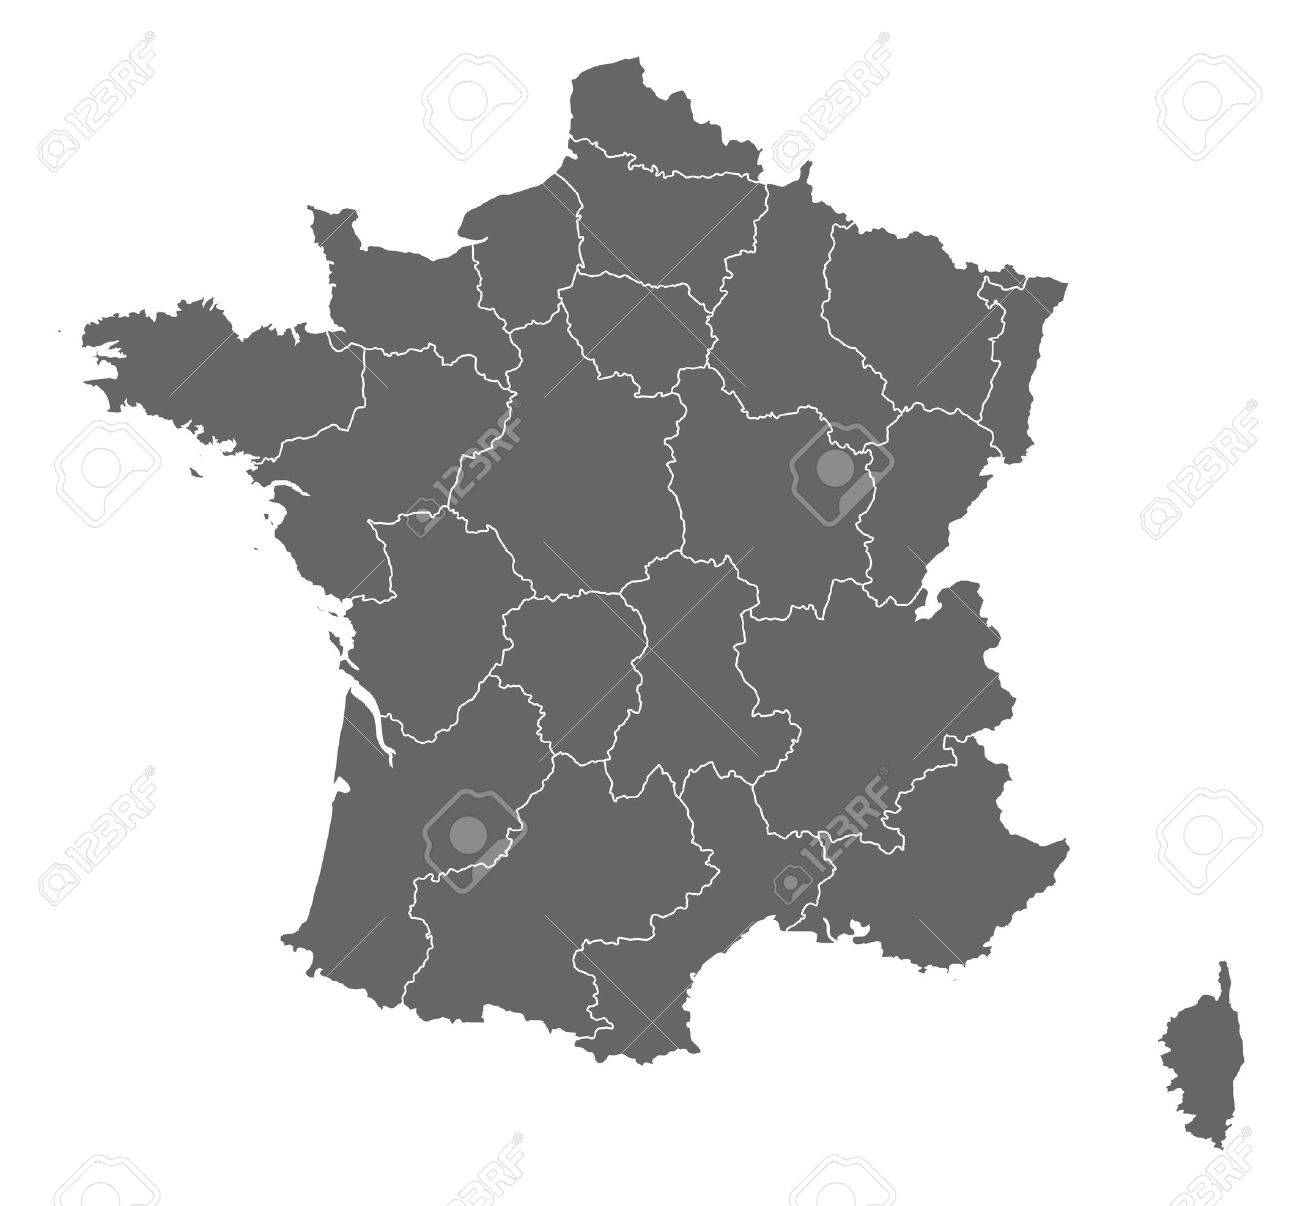 Politisk Karta Over Frankrike Med Flera Regioner Royalty Fri